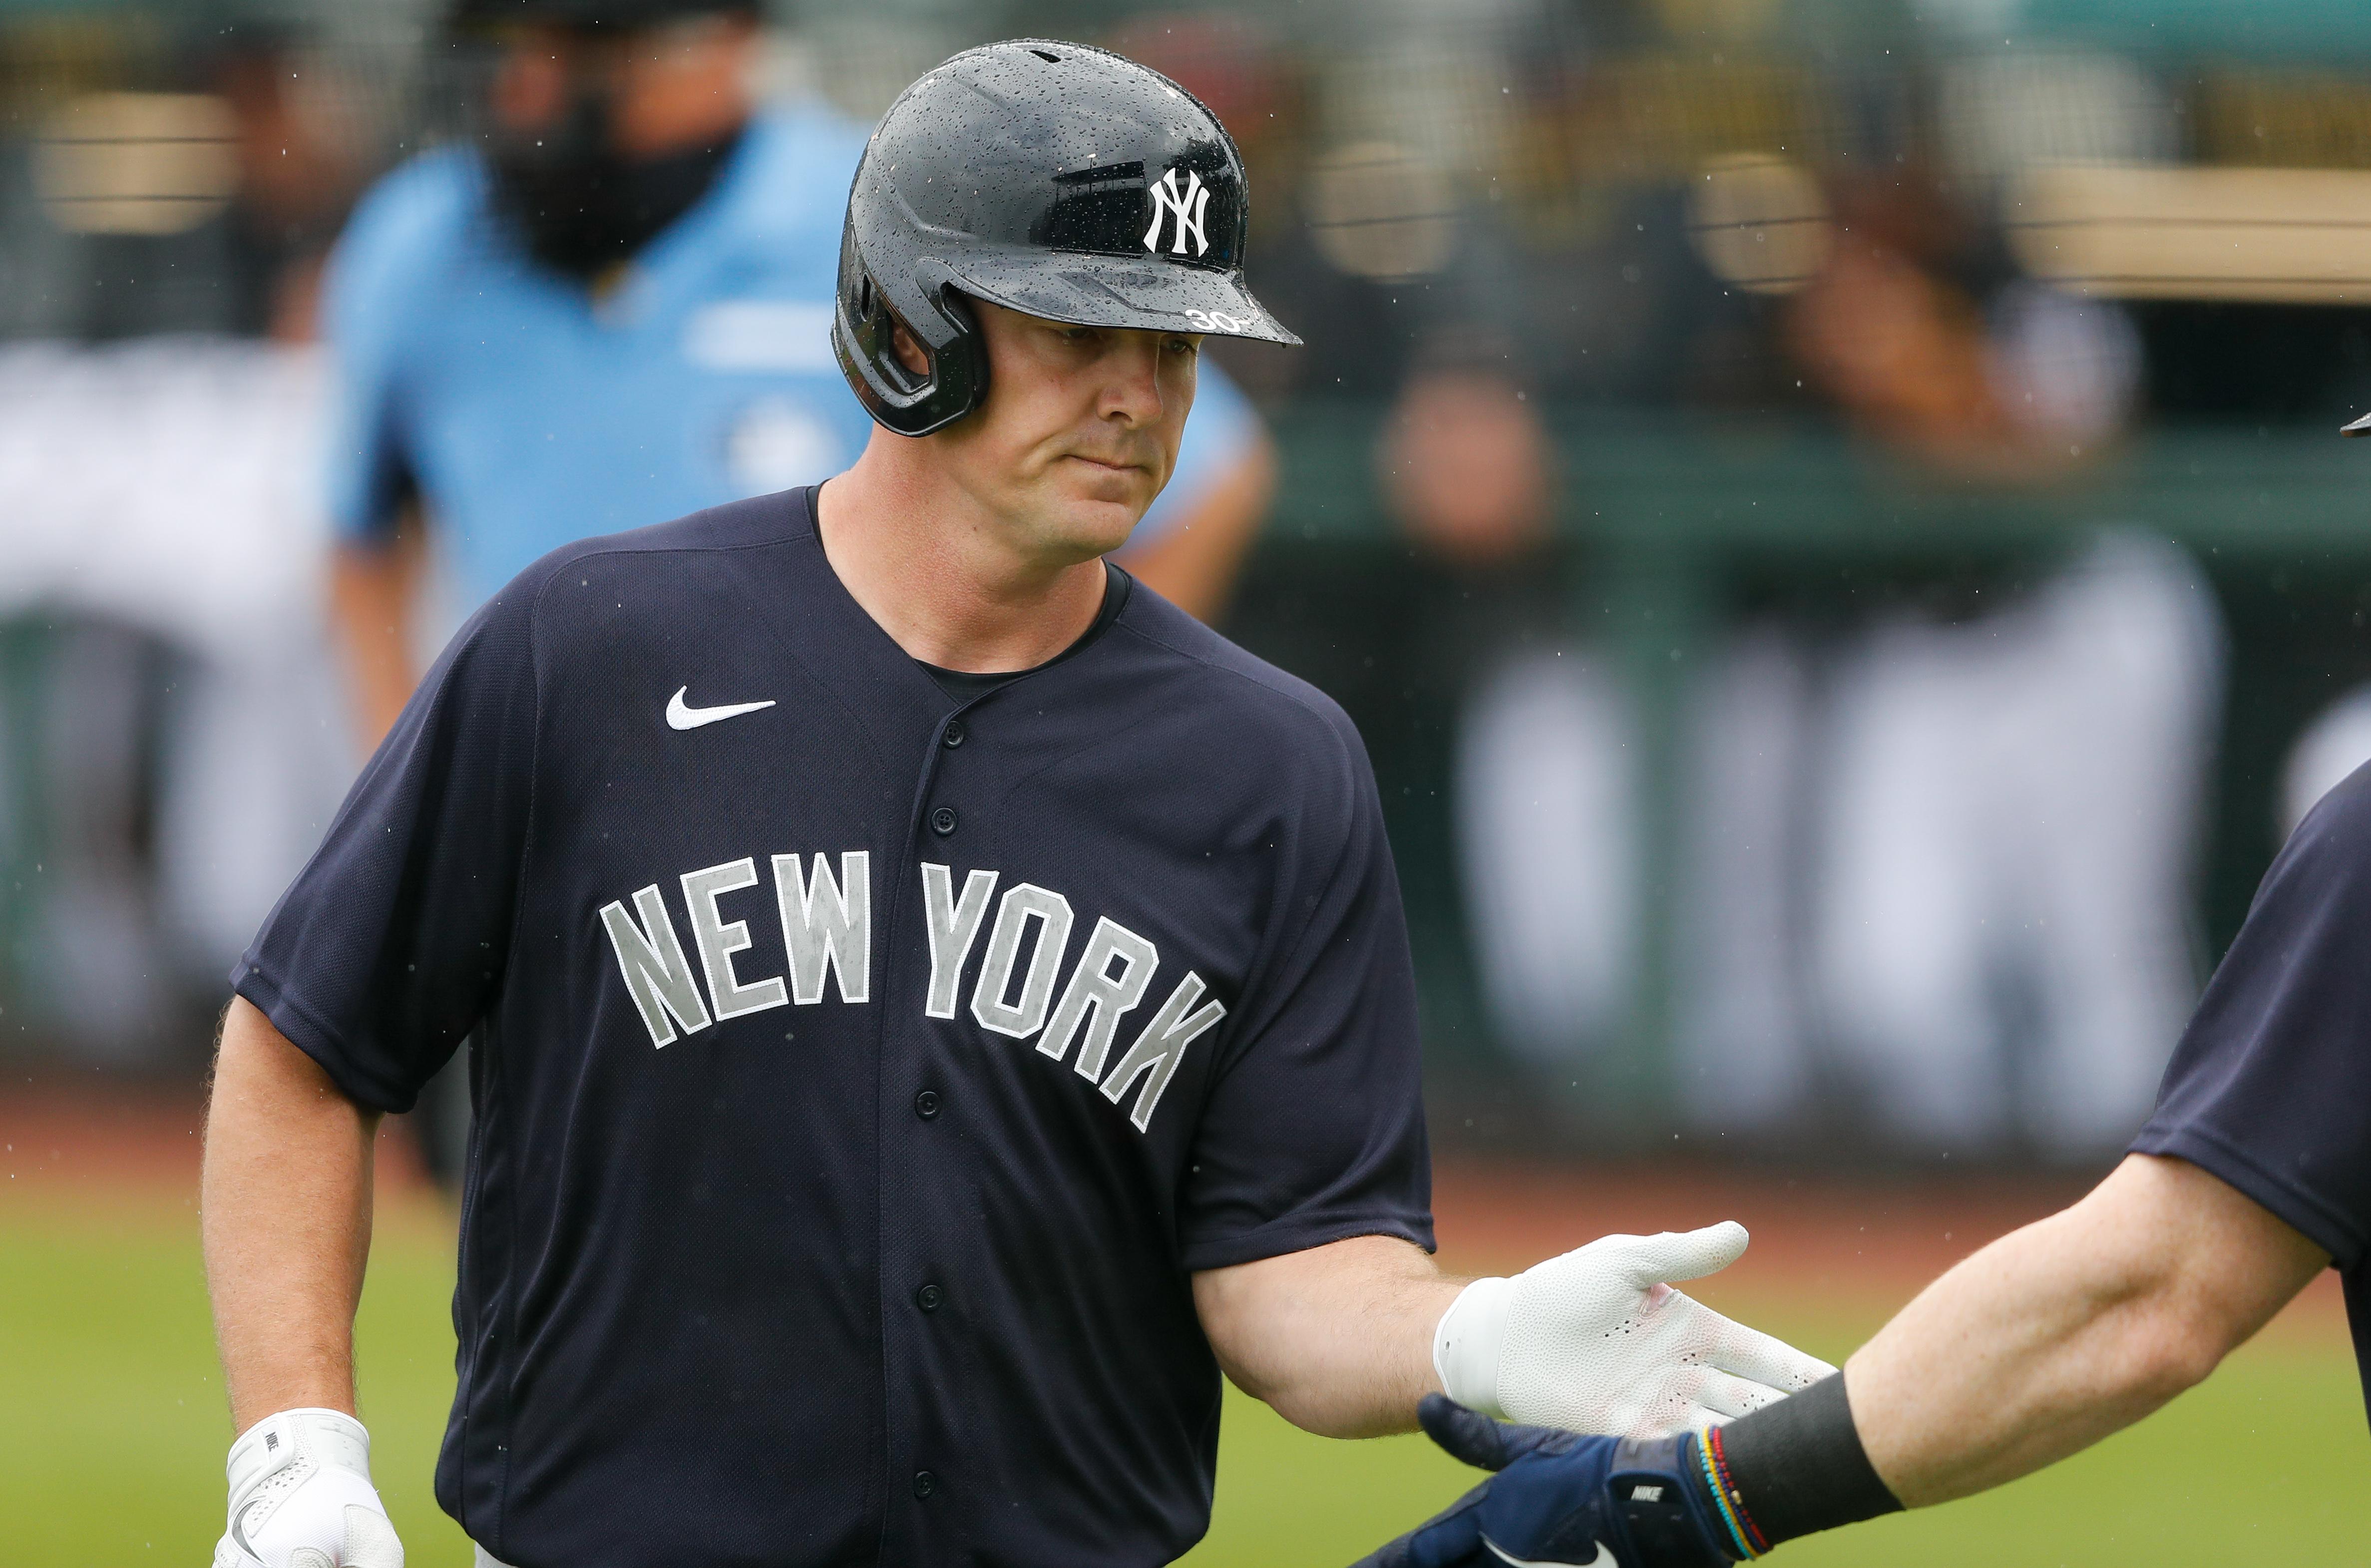 MLB: New York Yankees at Pittsburgh Pirates